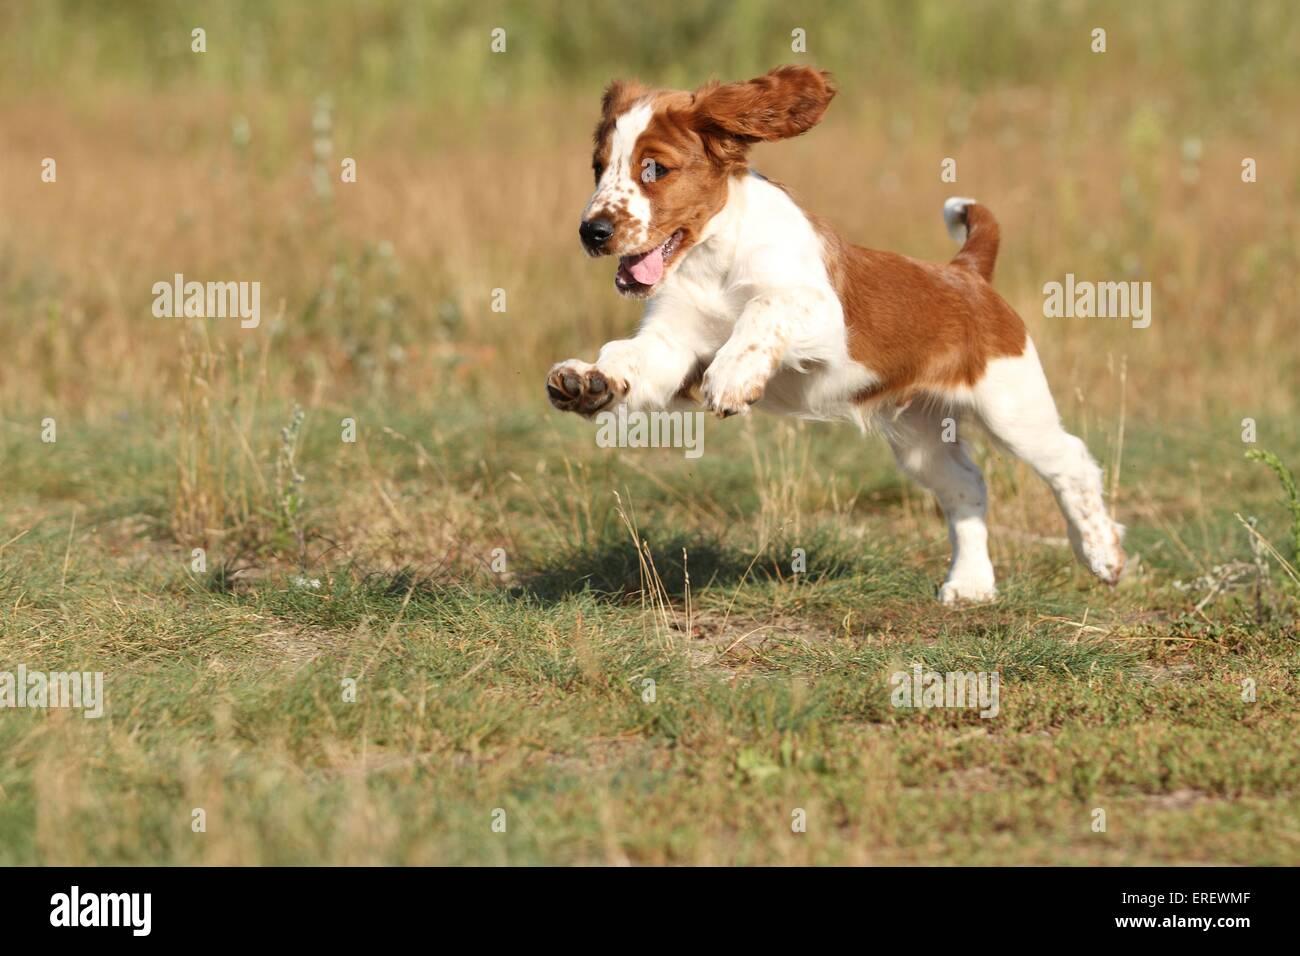 Springer Spaniel Puppy Stock Photos Springer Spaniel Puppy